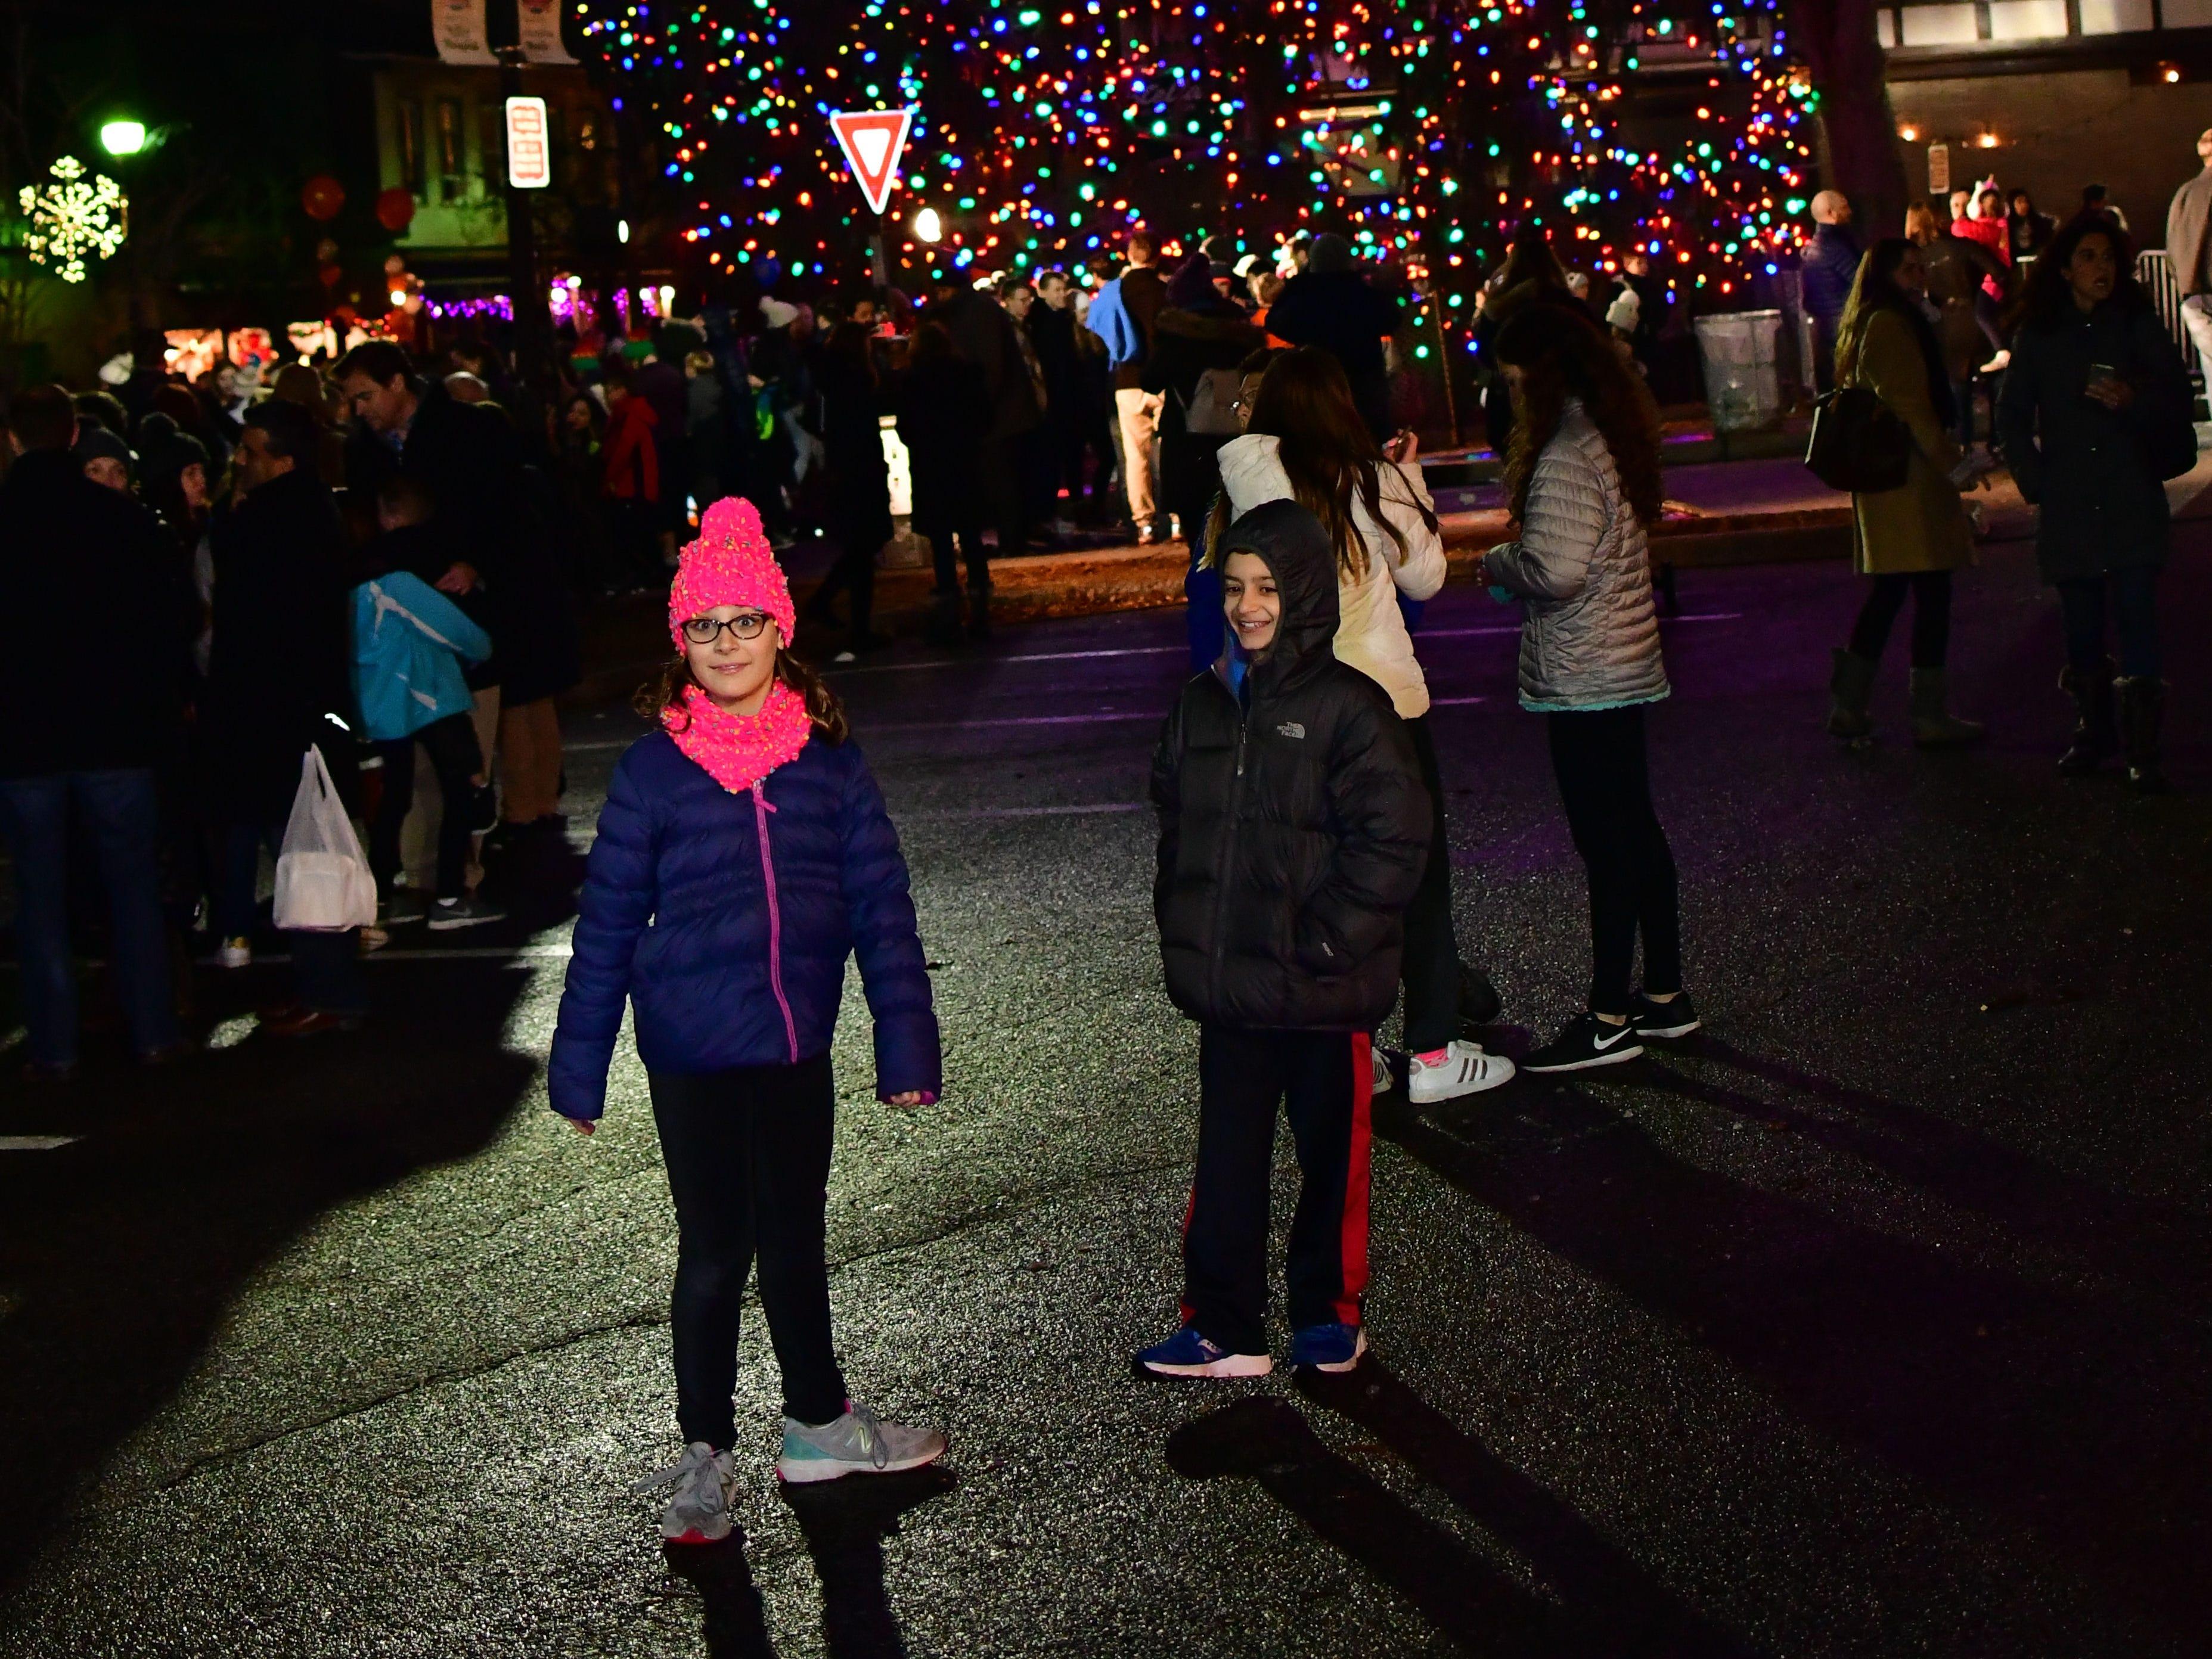 Holiday festivities along East Ridgewood Avenue in Ridgewood on Nov. 30.